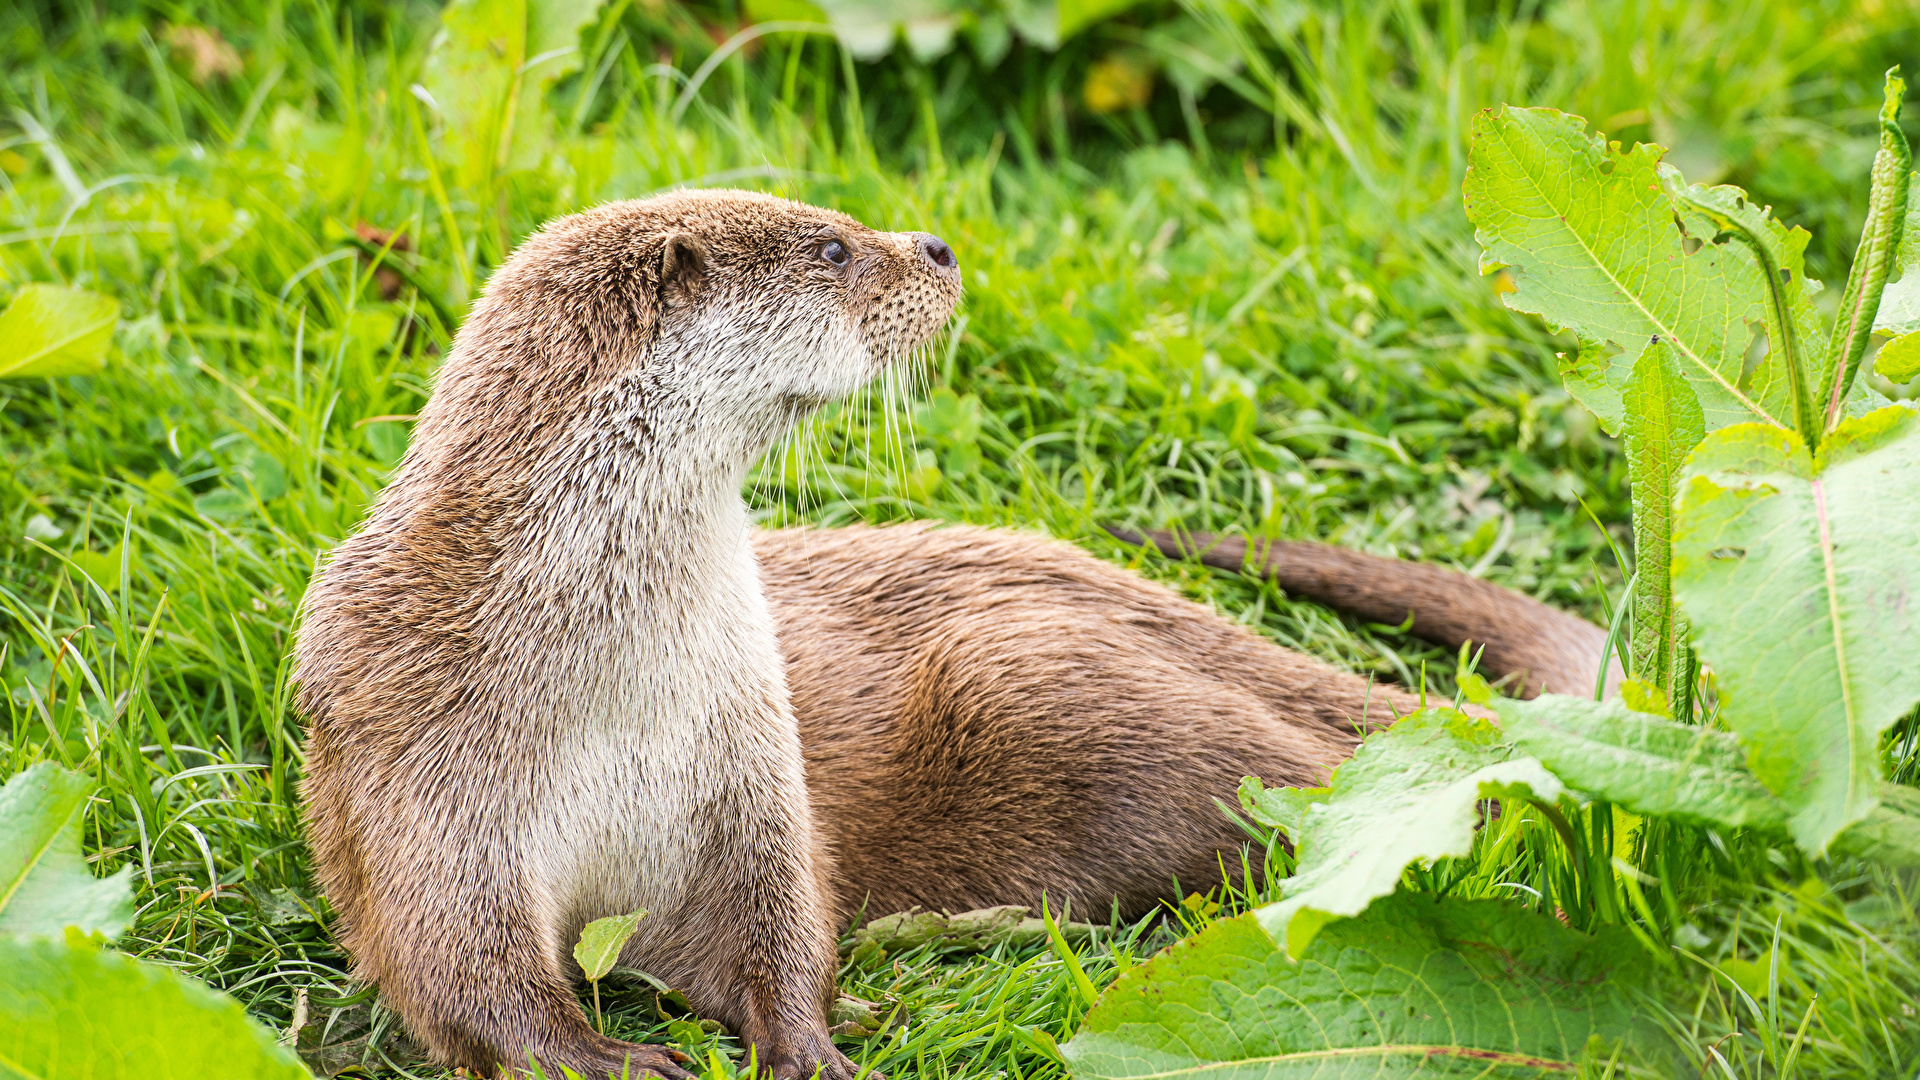 Pictures Animal Eurasian Otter Grass 1920x1080